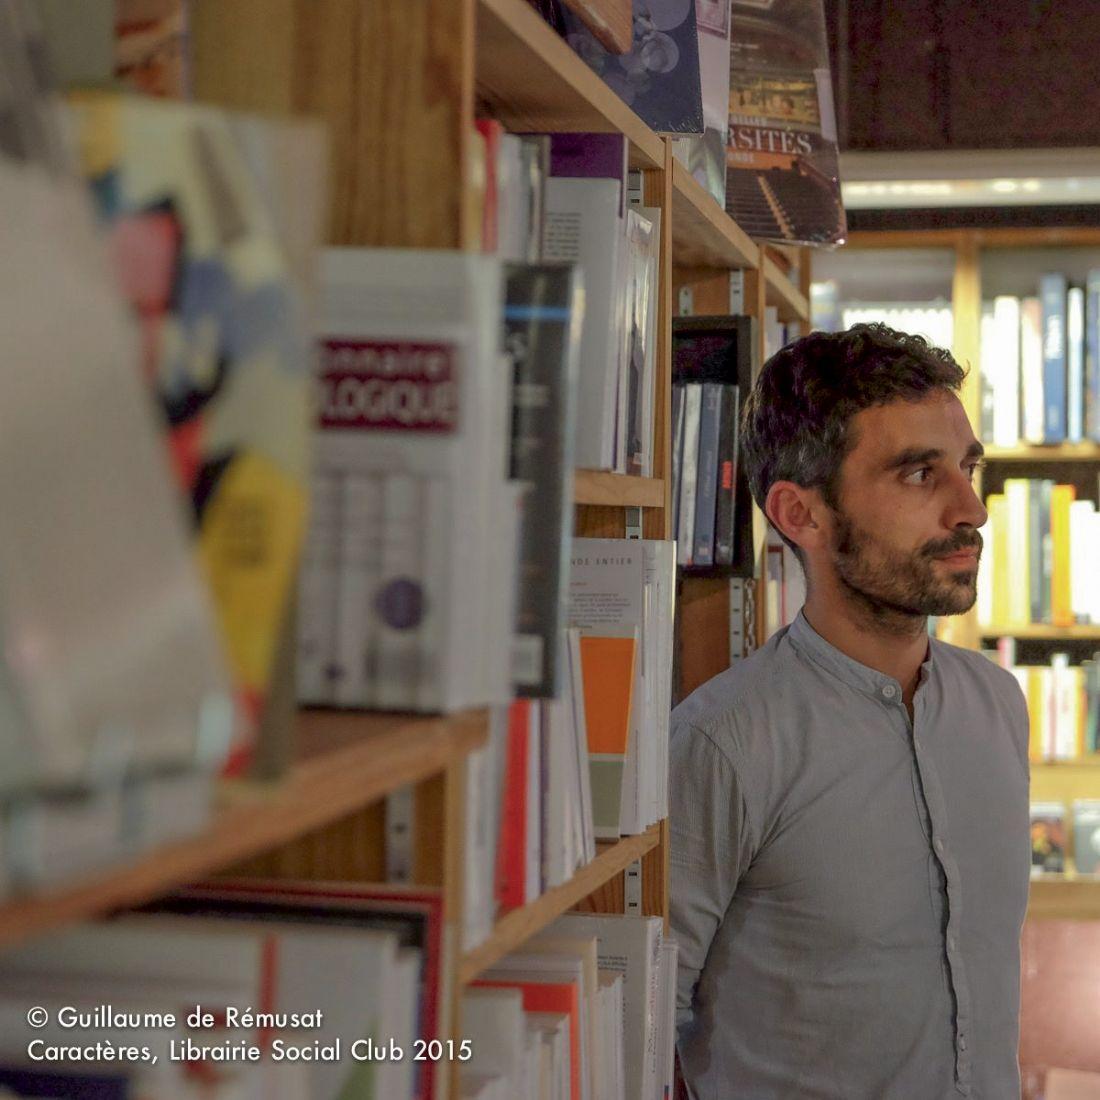 201 tude de cas la librairie caract 232 res de mont de marsan transform 233 e en p 244 le culturel